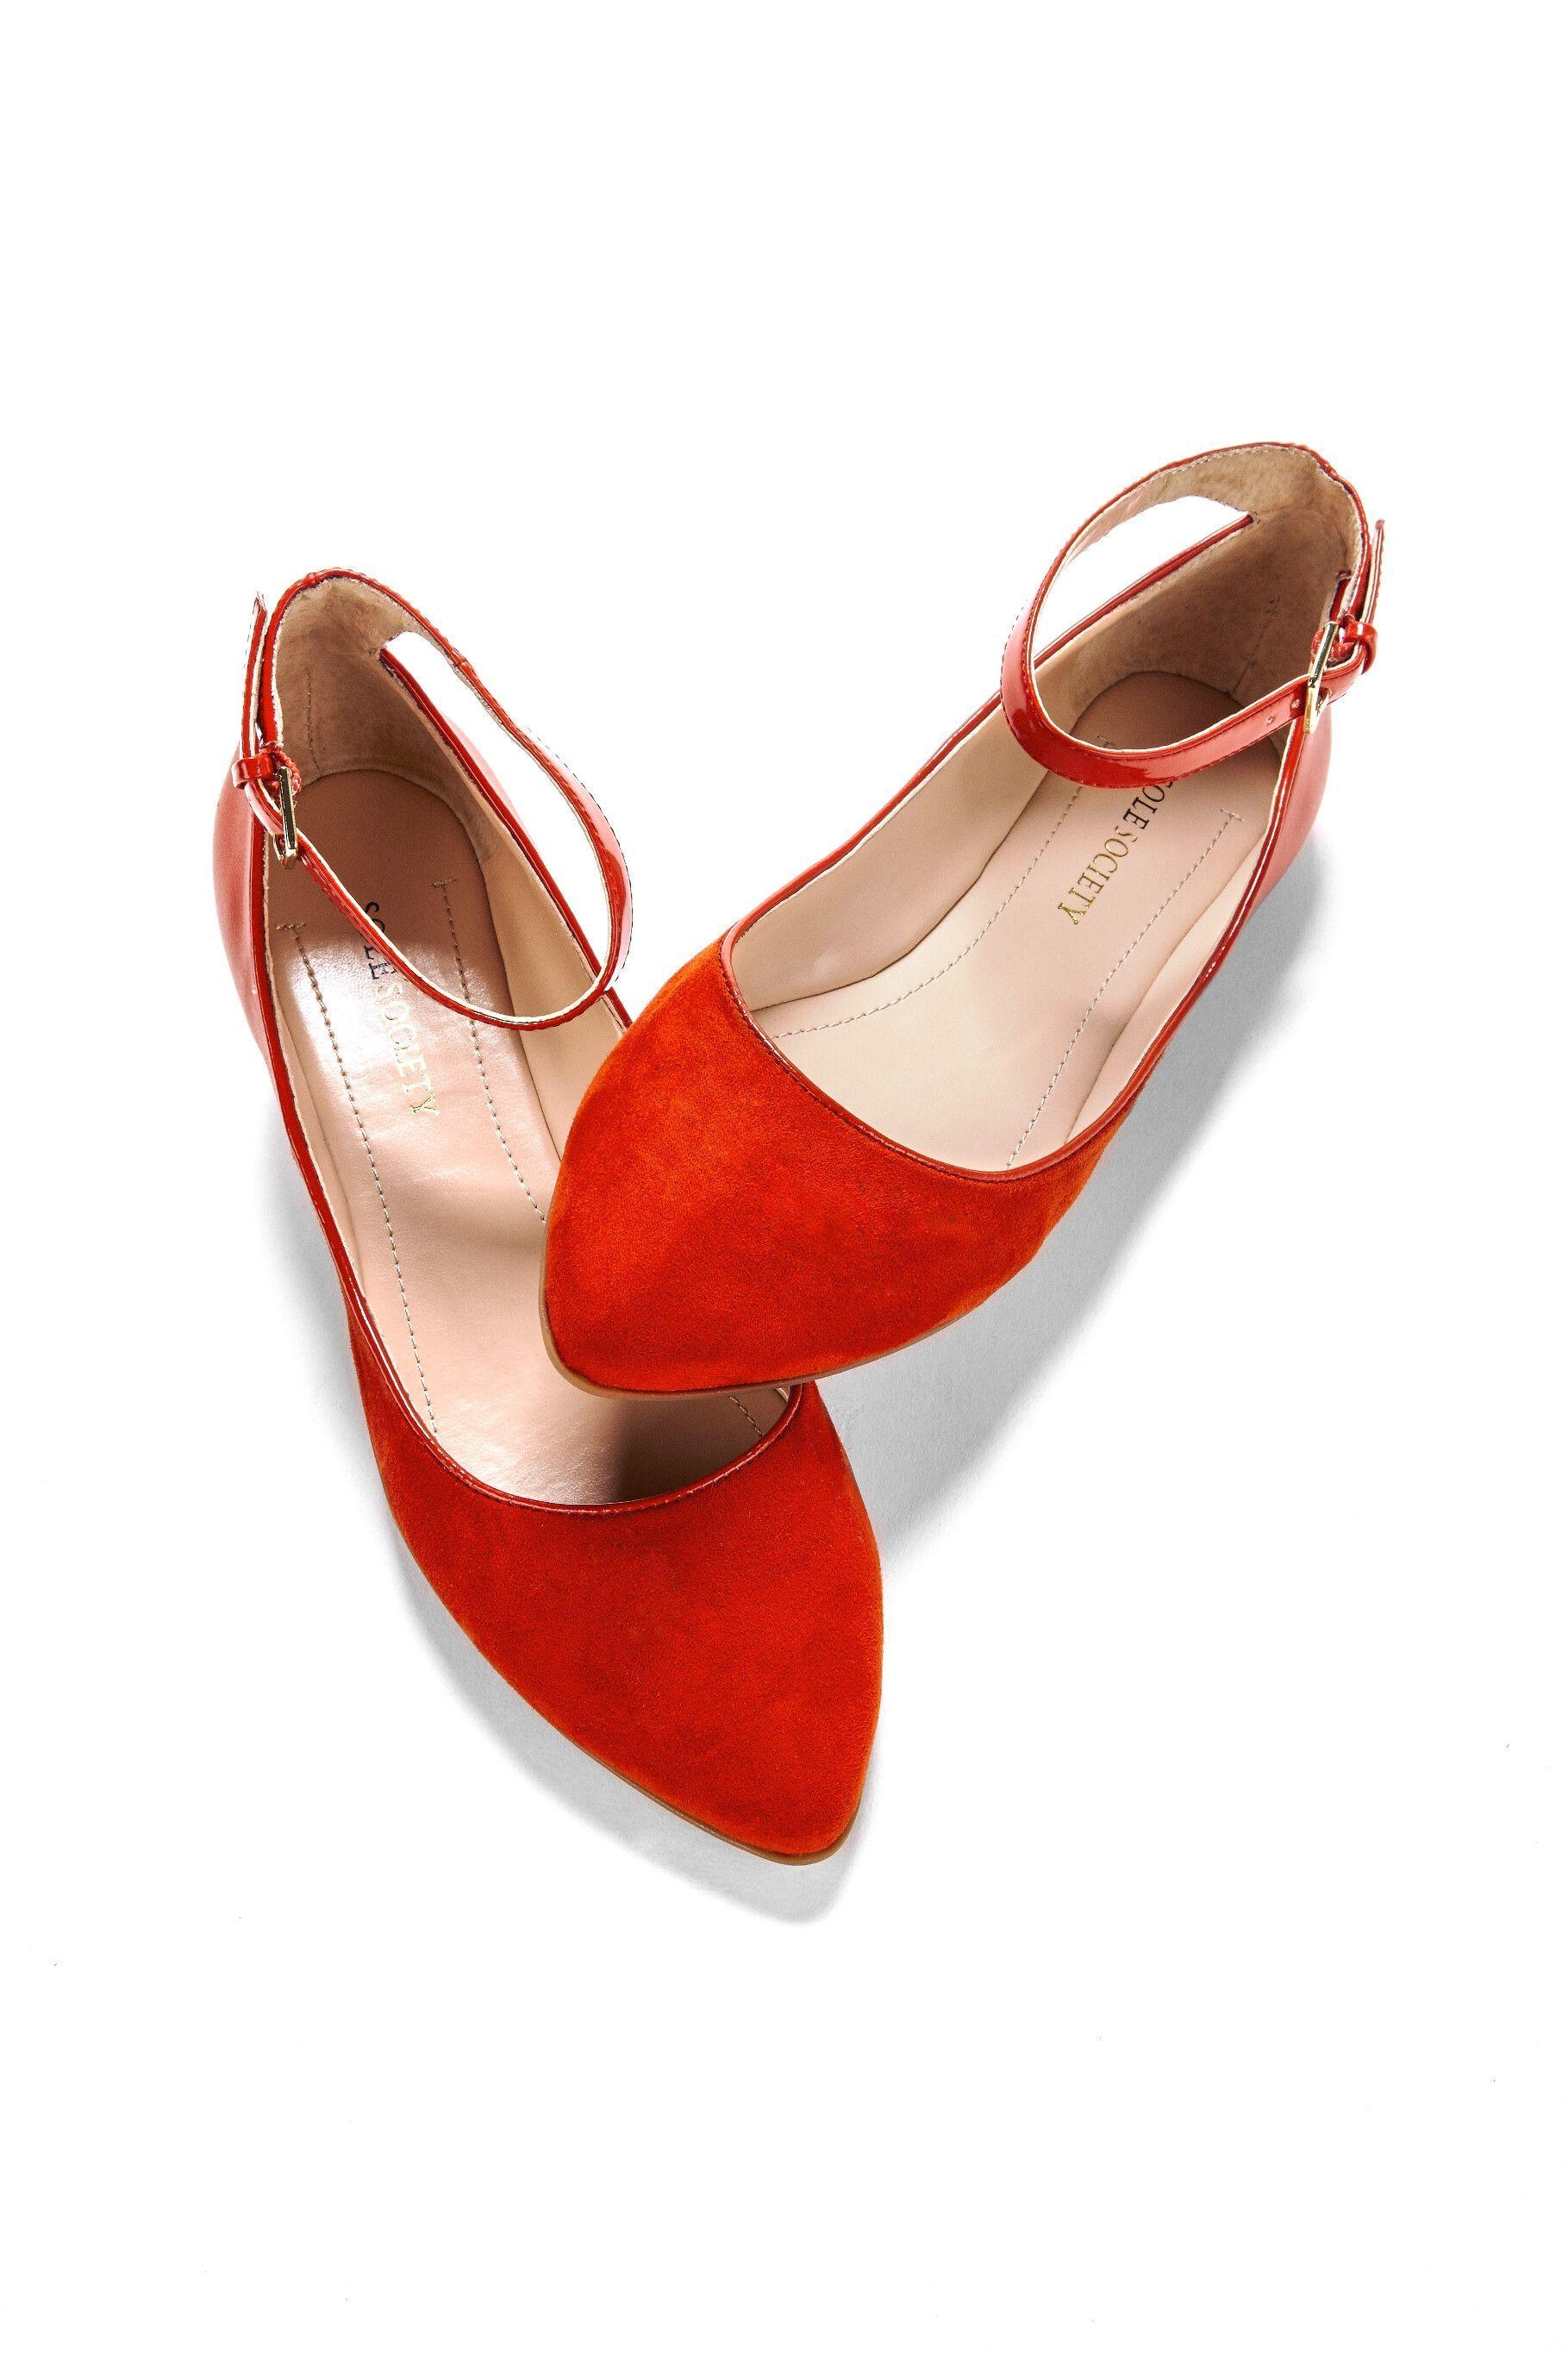 cae5ed603daa Crazy Tips and Tricks  Running Shoes Reebok designer shoes louis  vuitton.Platform Shoes Boho shoes closet garage.Bridal Shoes Comfortable.